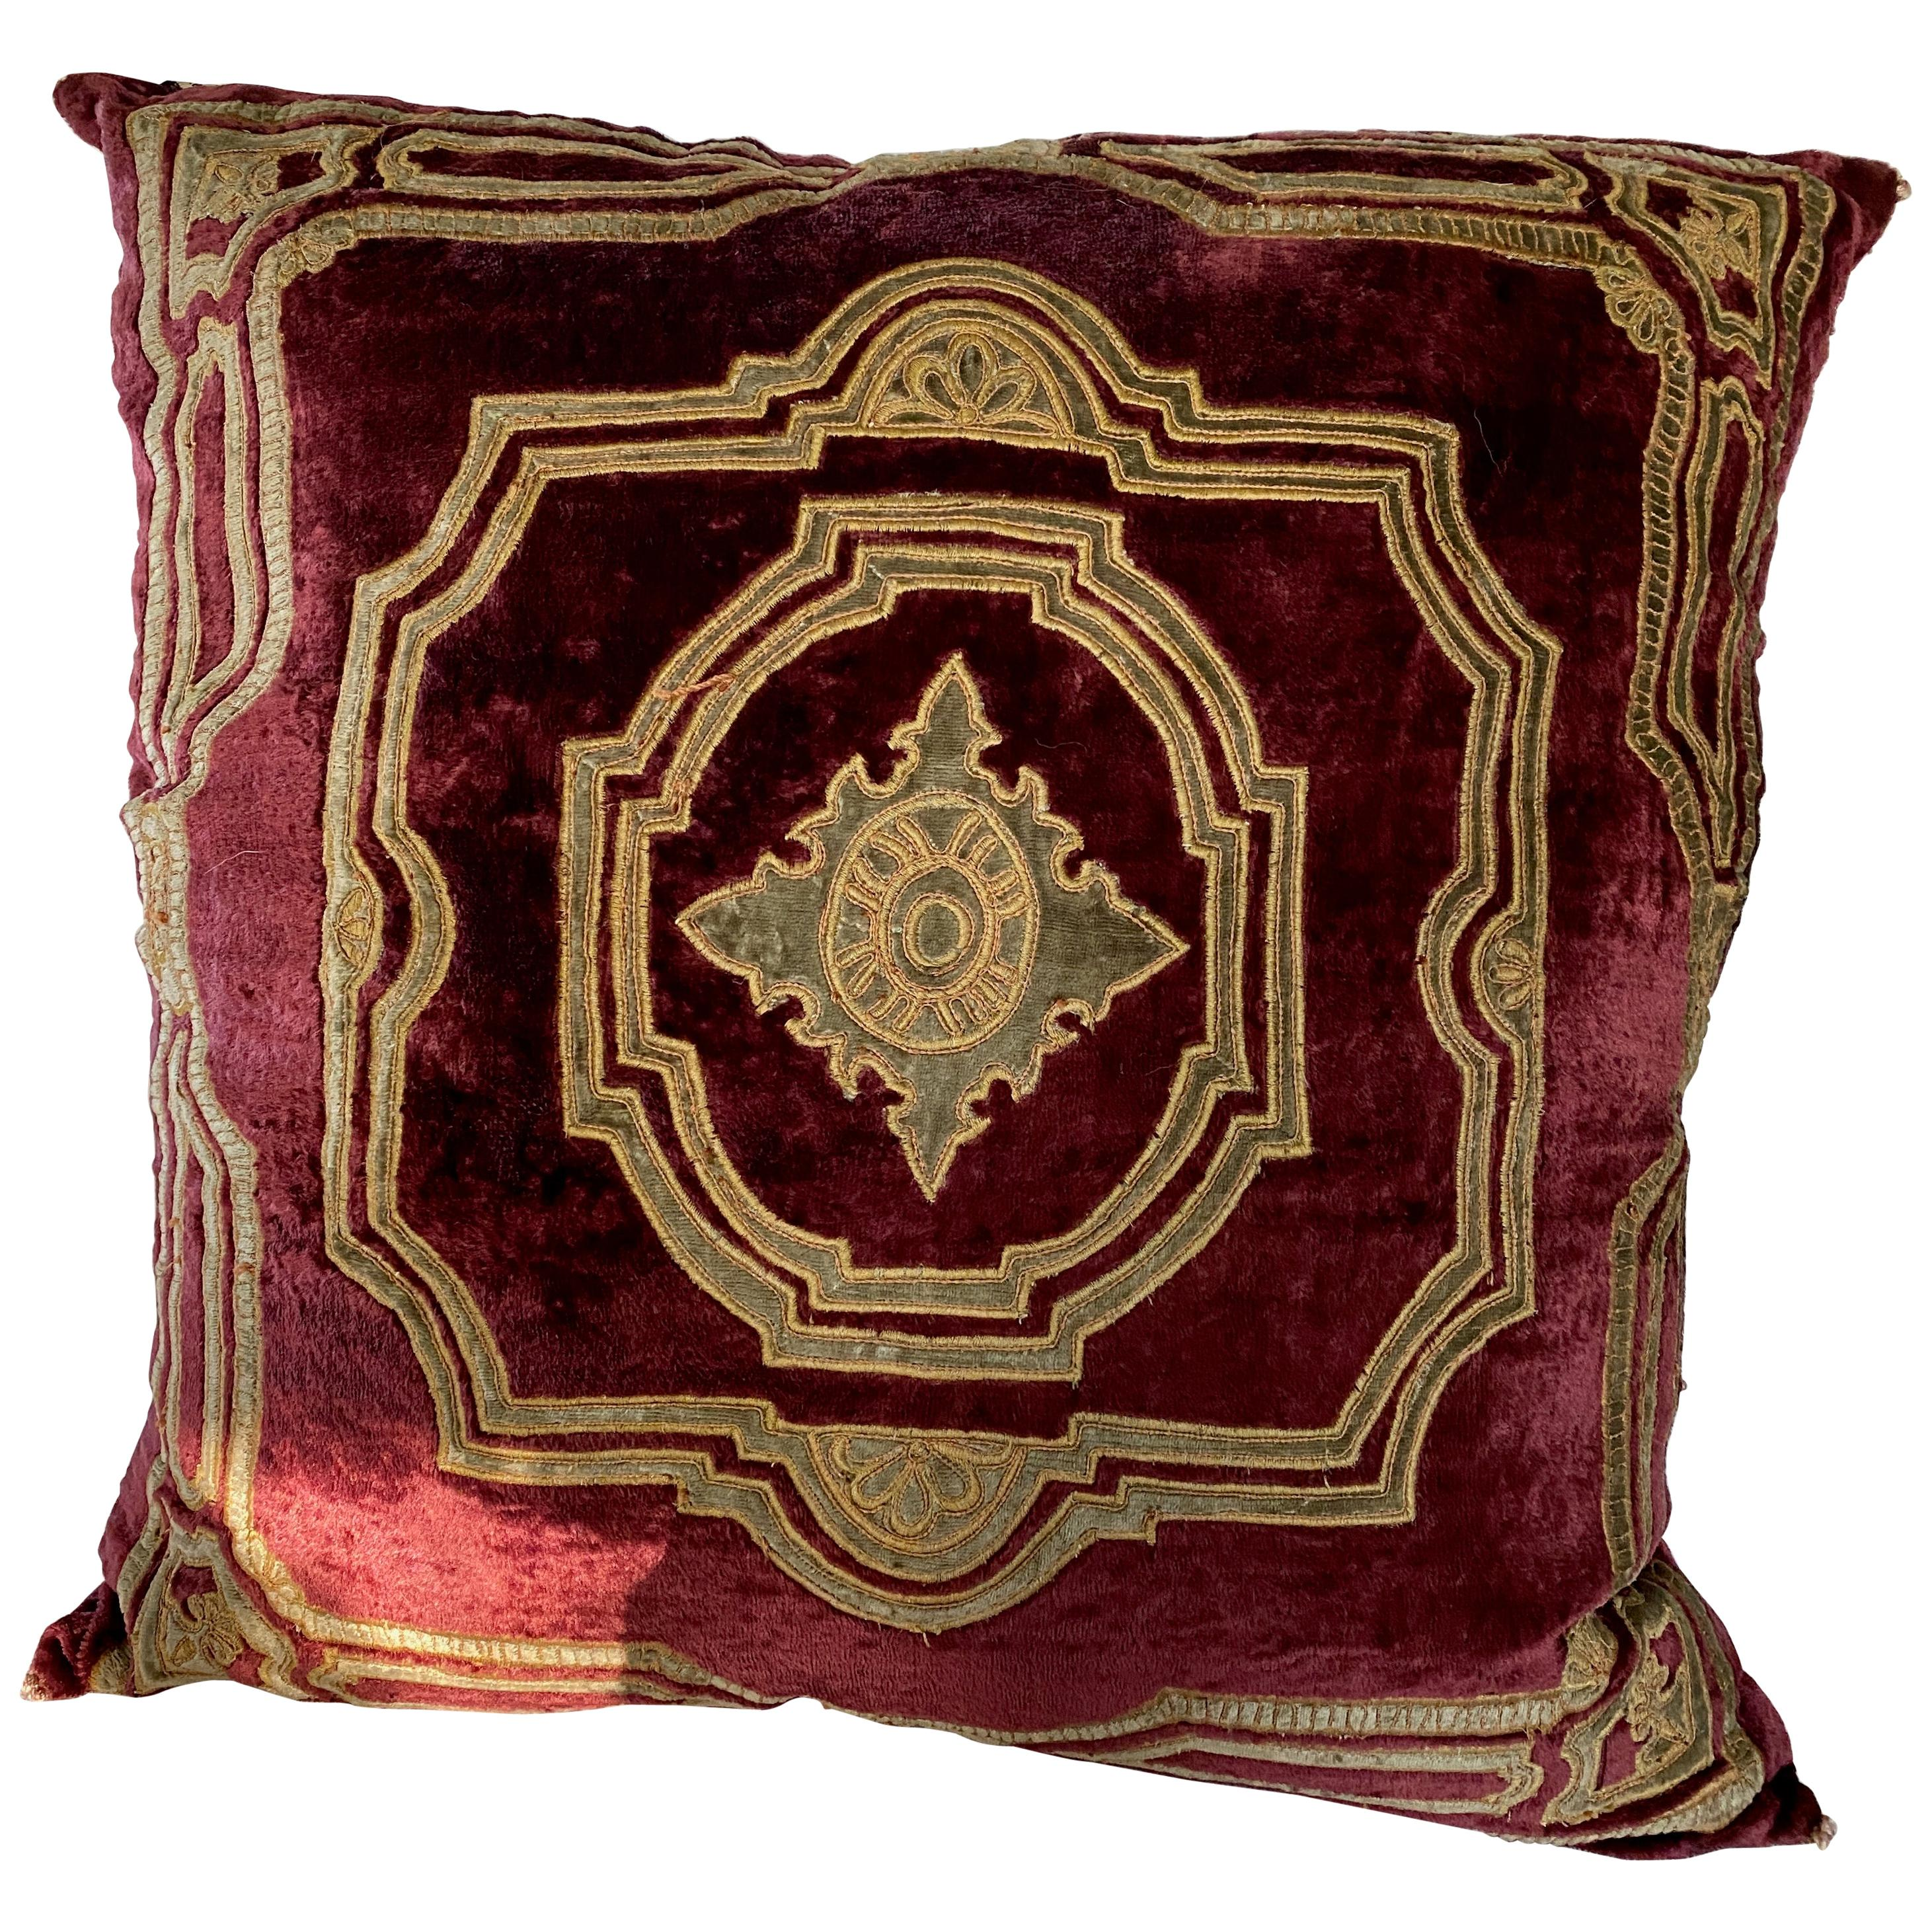 Gold on Velvet Embroidered Pillow, Down Filled